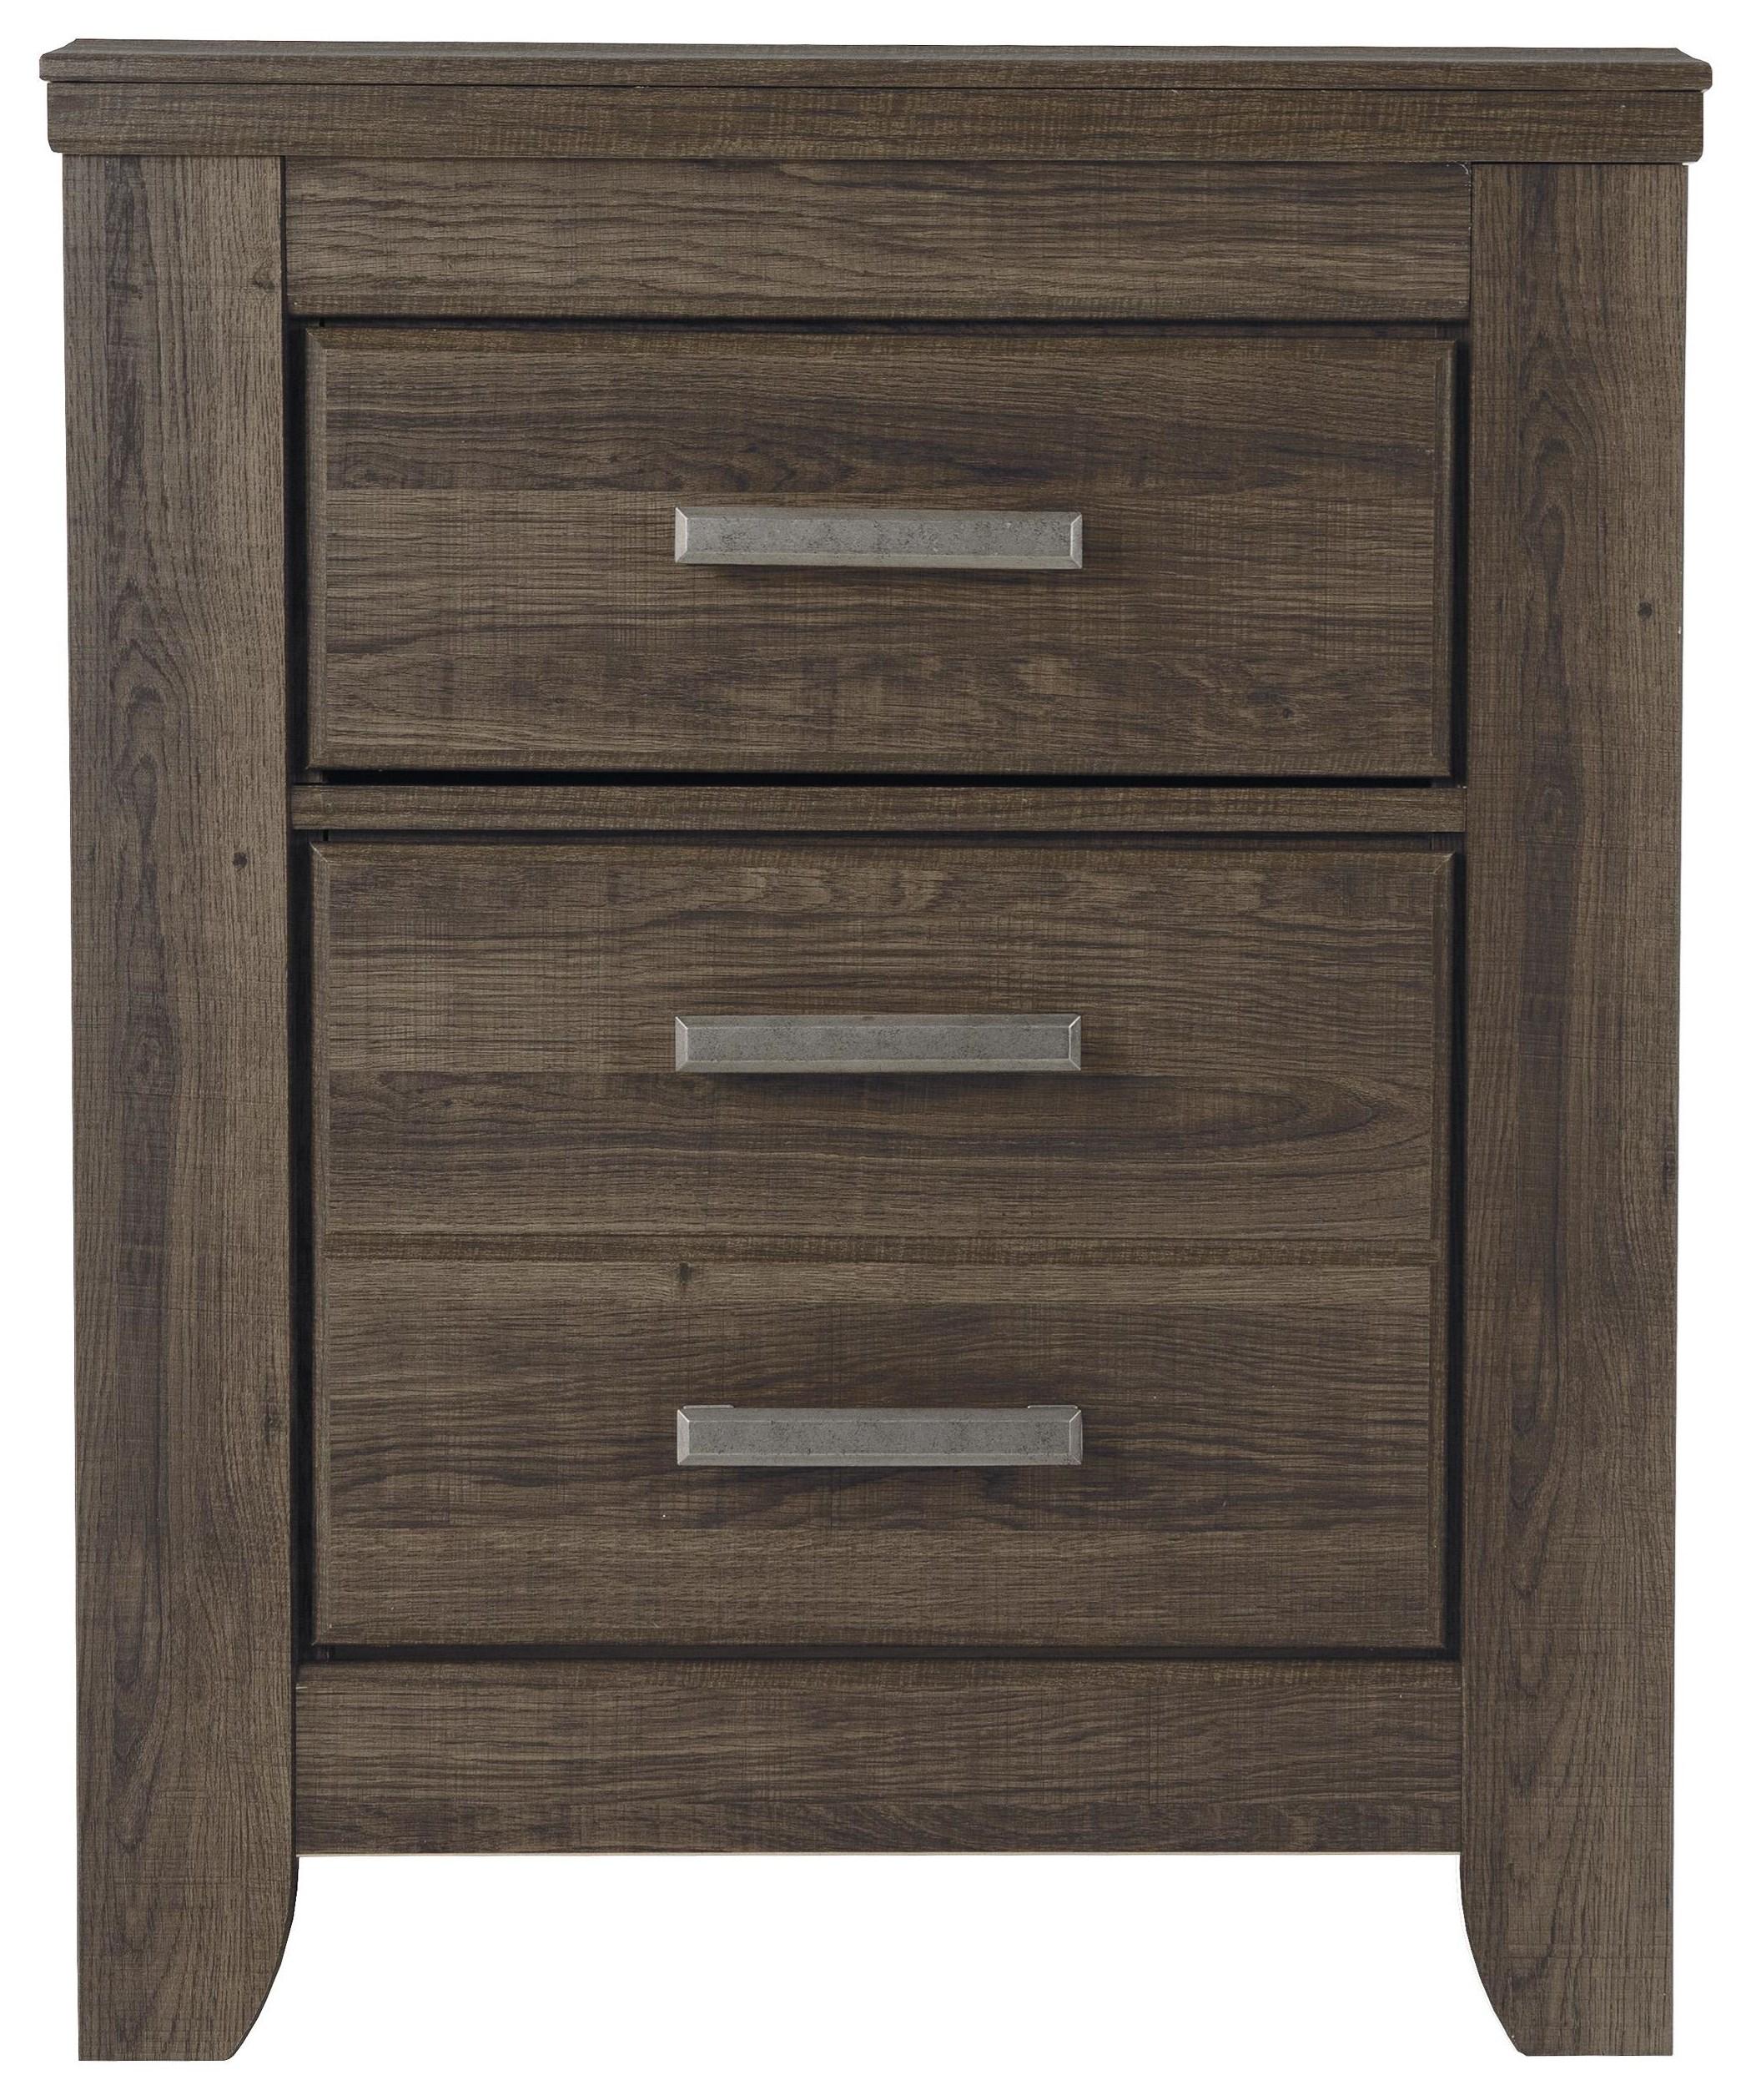 Juararo 2 Drawer Nightstand by Signature Design by Ashley at HomeWorld Furniture